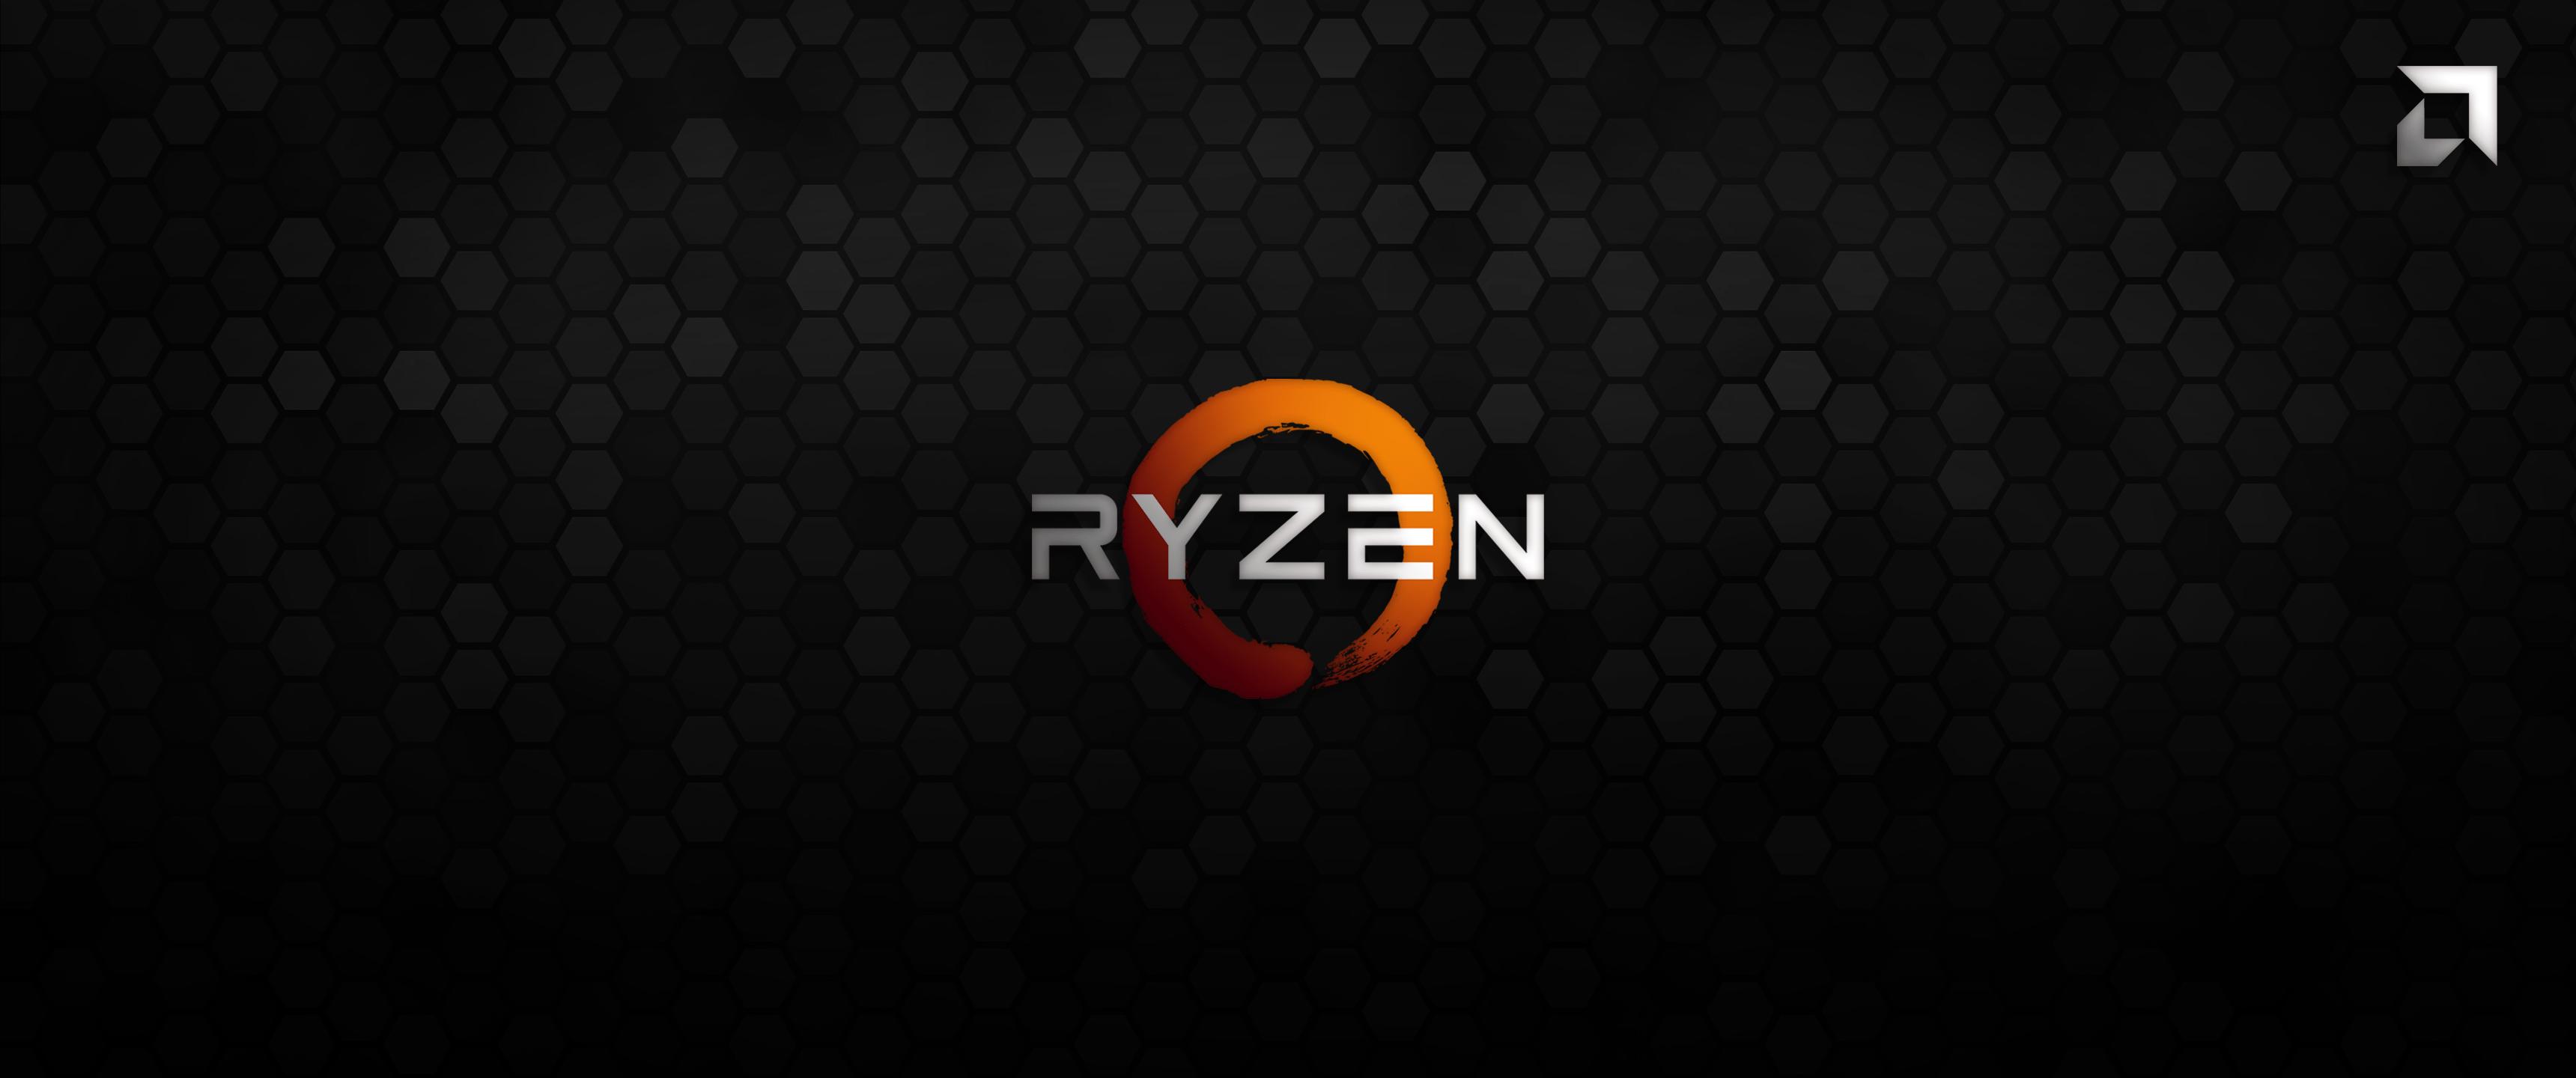 Ryzen Wallpapers Top Free Ryzen Backgrounds Wallpaperaccess